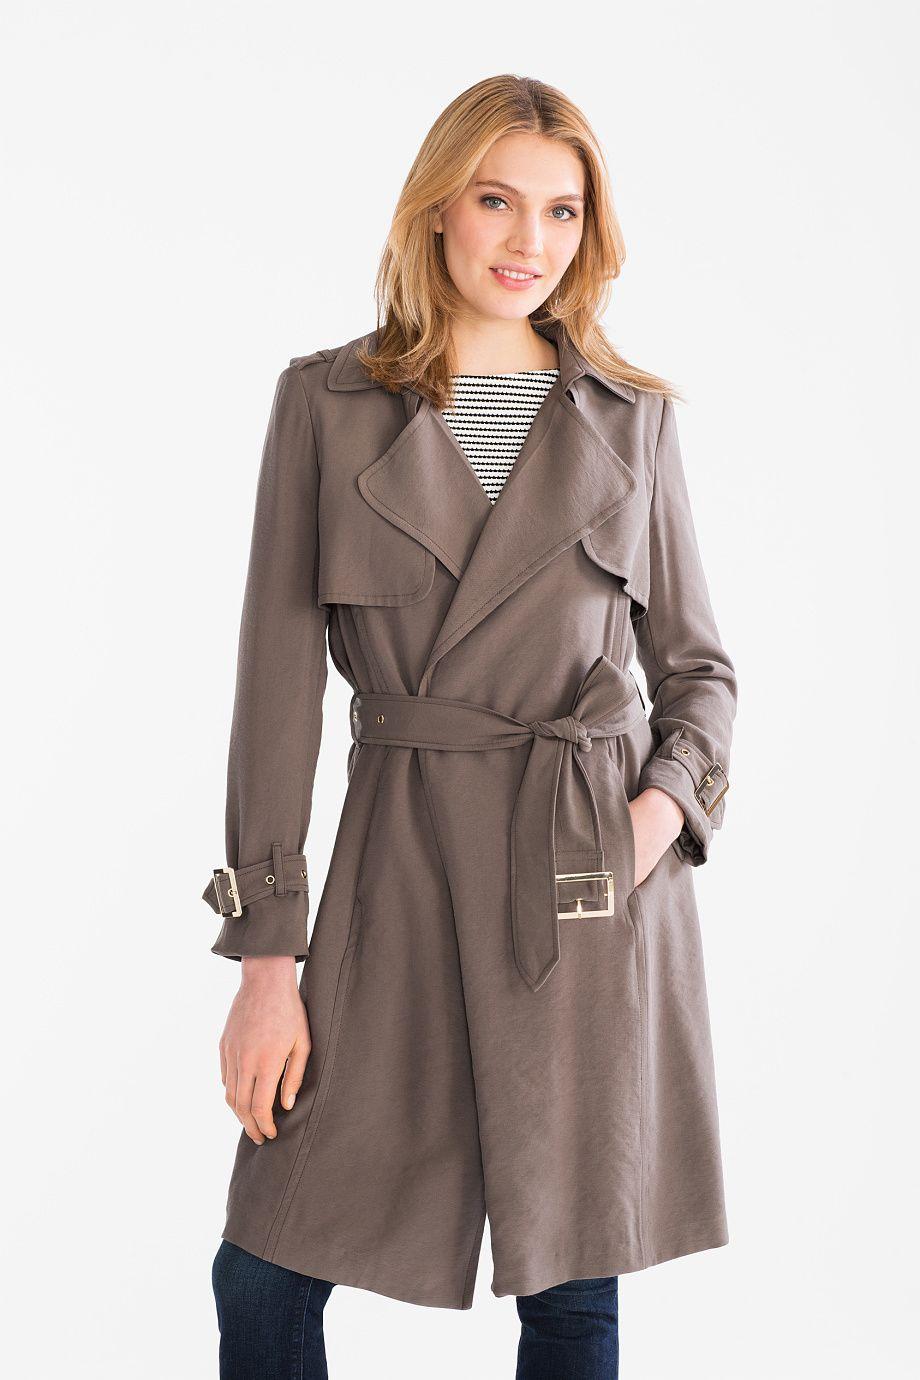 Women Business trench coat dark green   Coat, Fashion